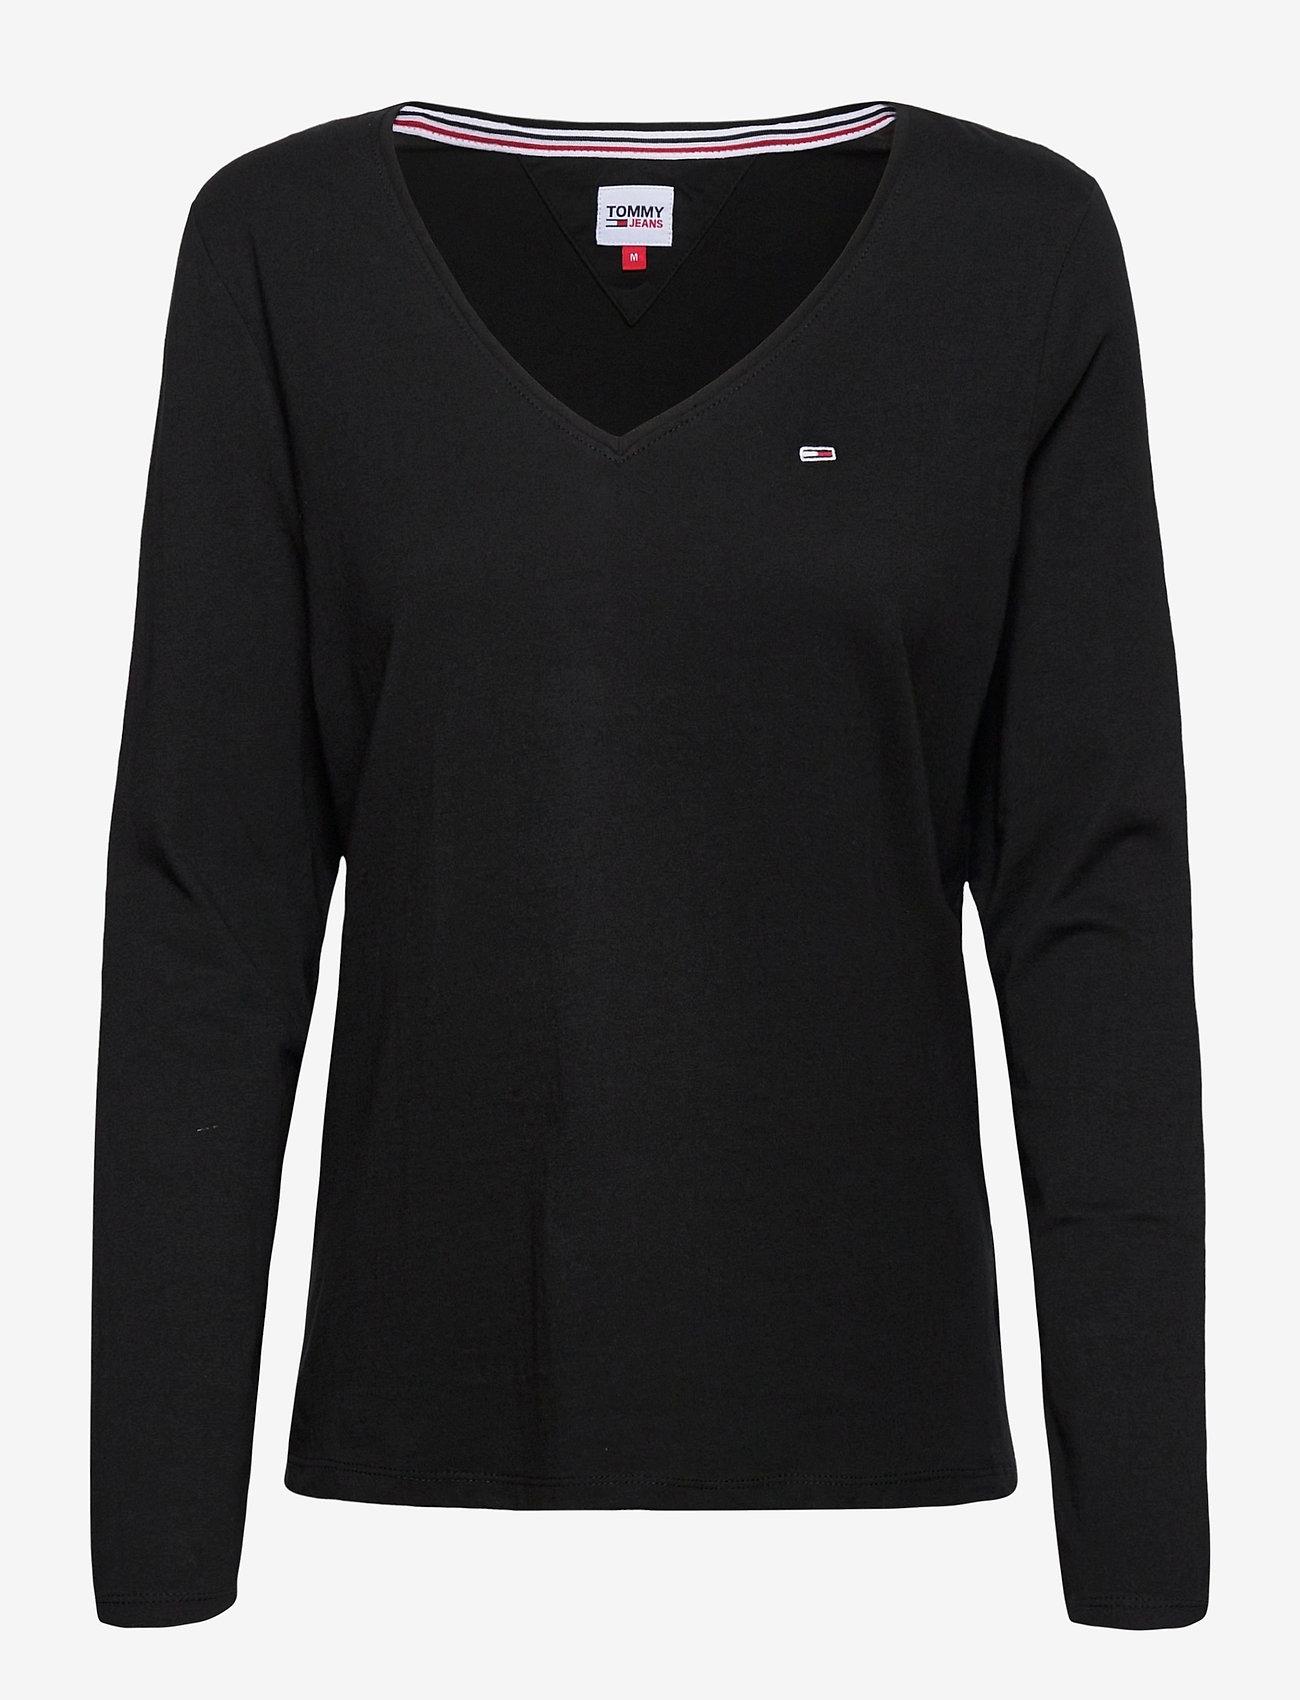 Tommy Jeans - TJW JERSEY V NECK LONGSLEEVE - long-sleeved tops - black - 0